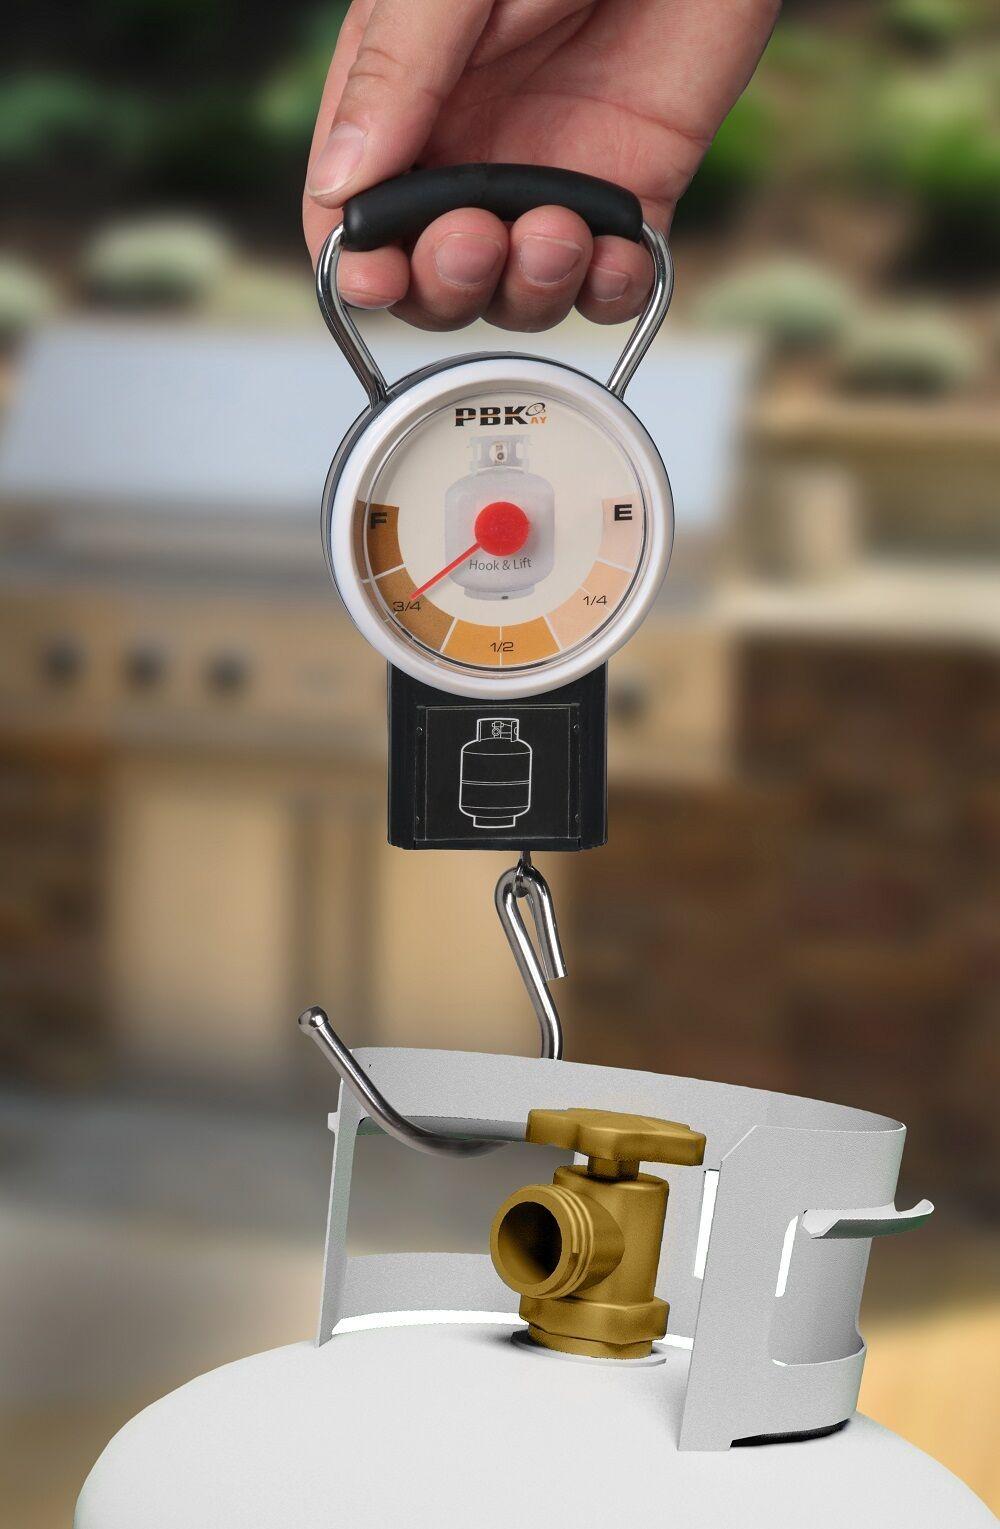 LEPG Fuel Butane Propane Bottle Tank Level Magnetic Gas Level Indicator Motorhome Caravan or Camping. Ideal for BBQ